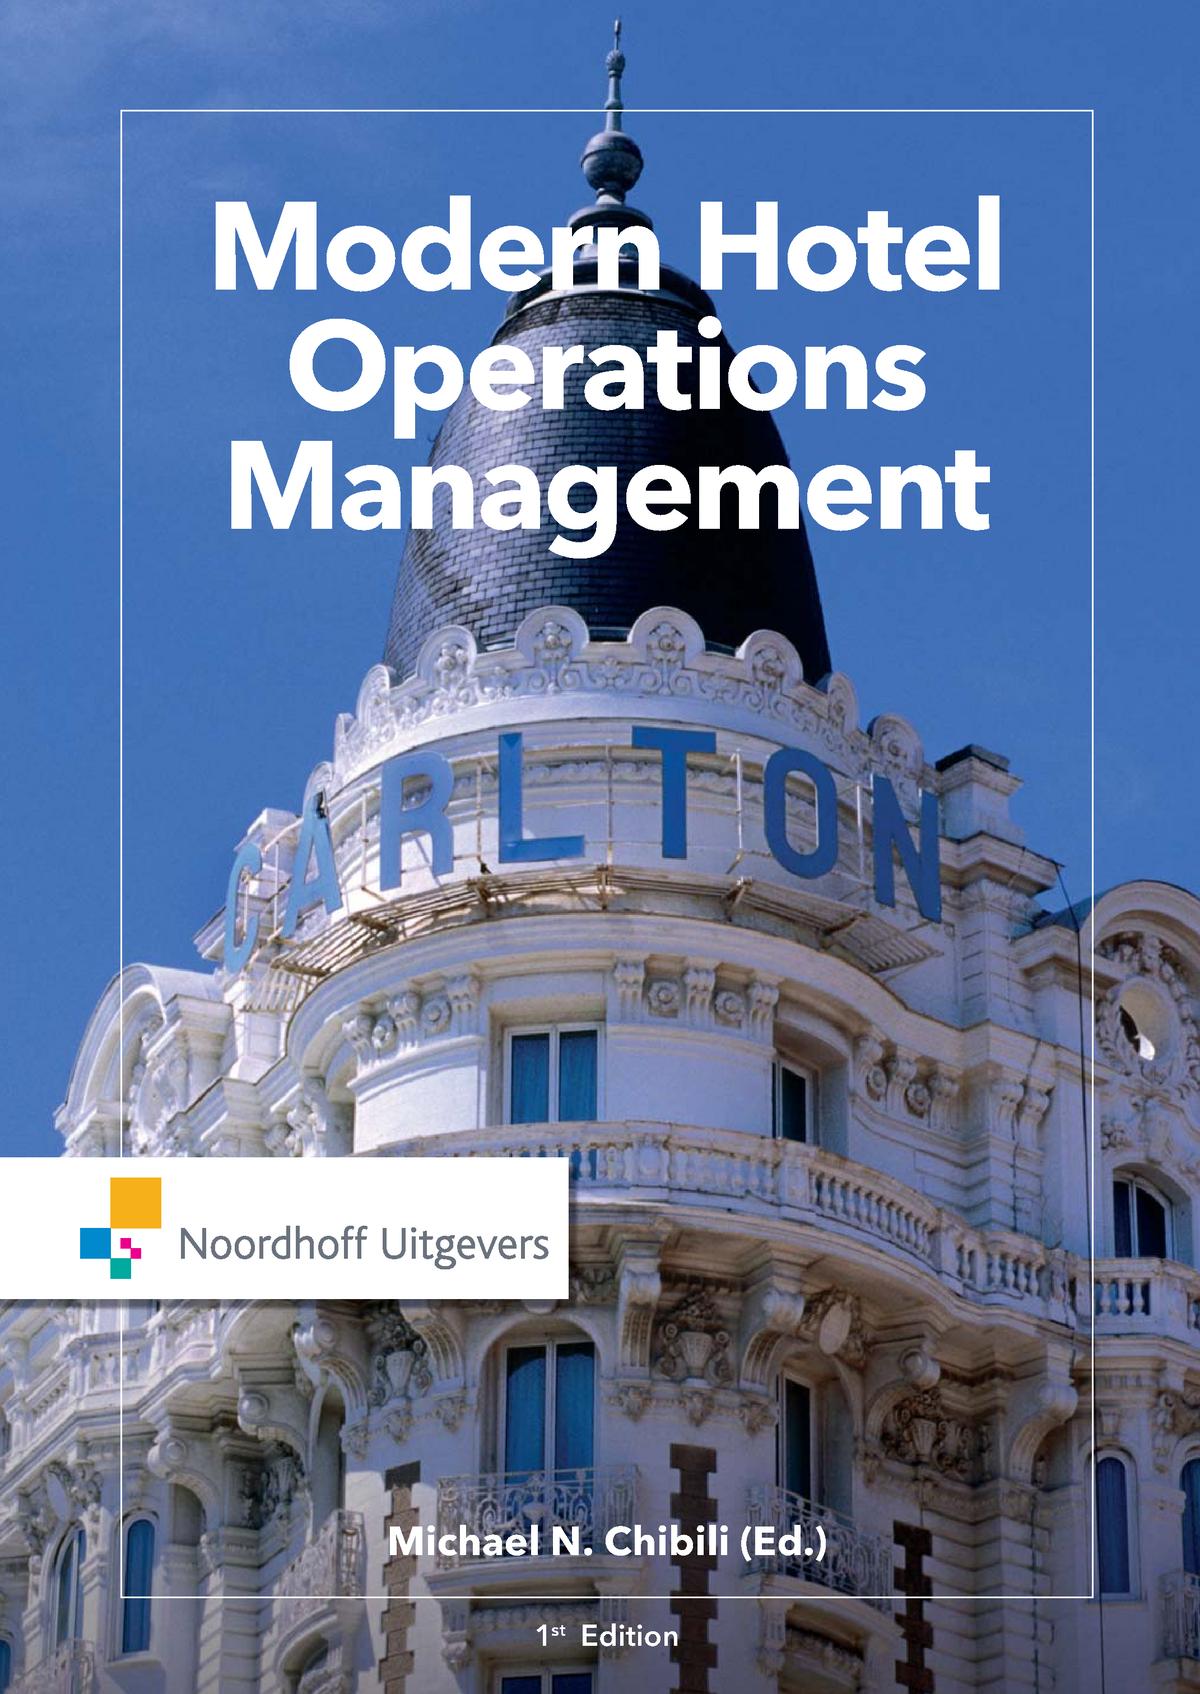 Modern hotel operations management - 5 2 - StuDocu